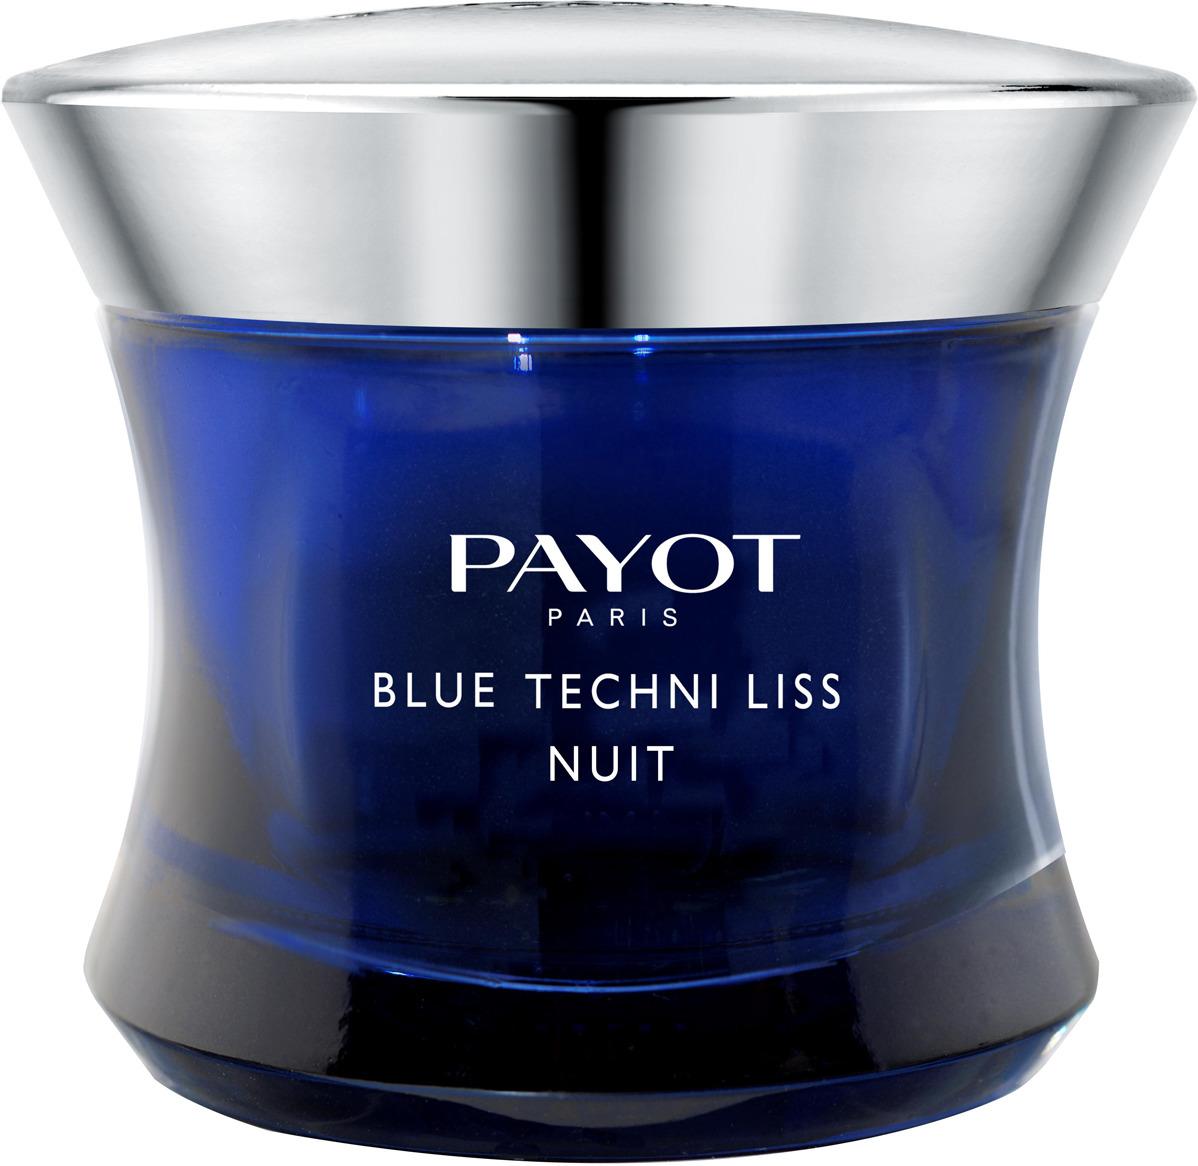 Бальзам для ухода за кожей Blue Techni Liss, ночной, хроноактивный, 50 мл ночной хроноактивный бальзам для лица payot blue techni liss 50 мл